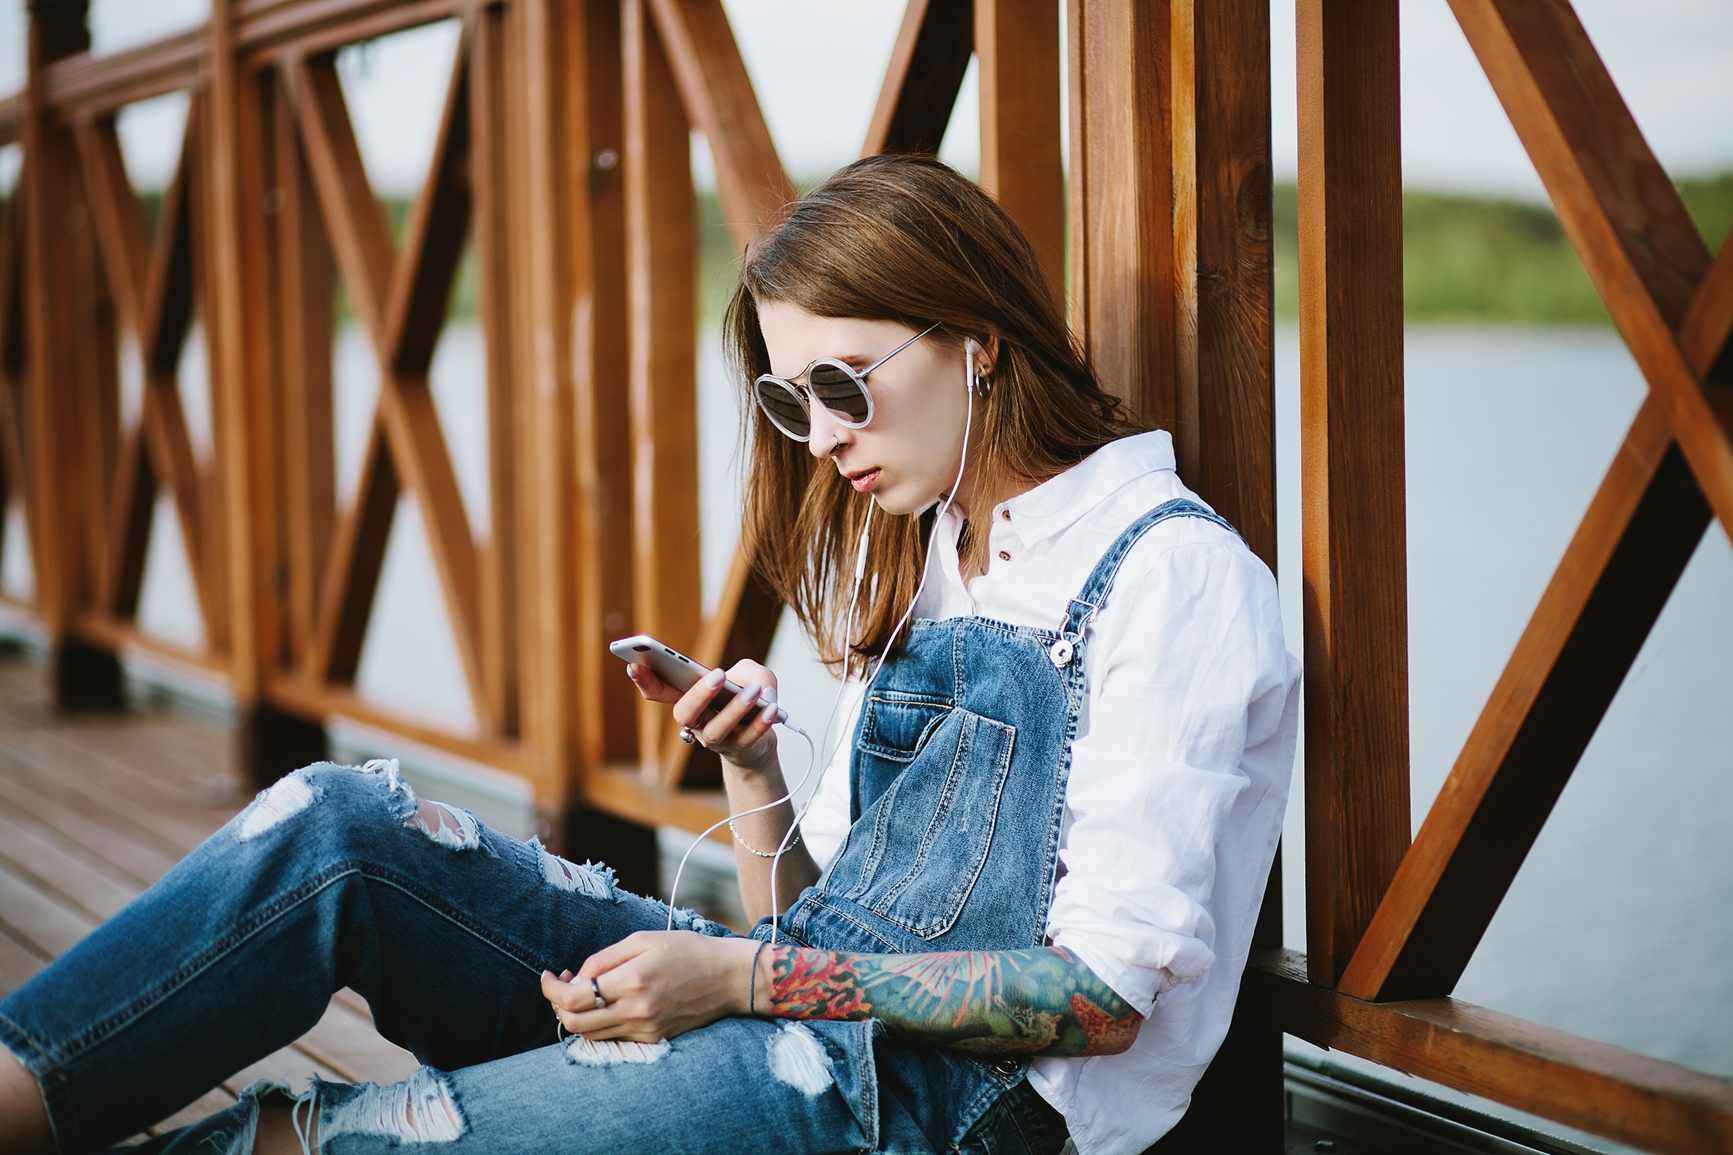 woman sitting on bridge scrolling on phone.